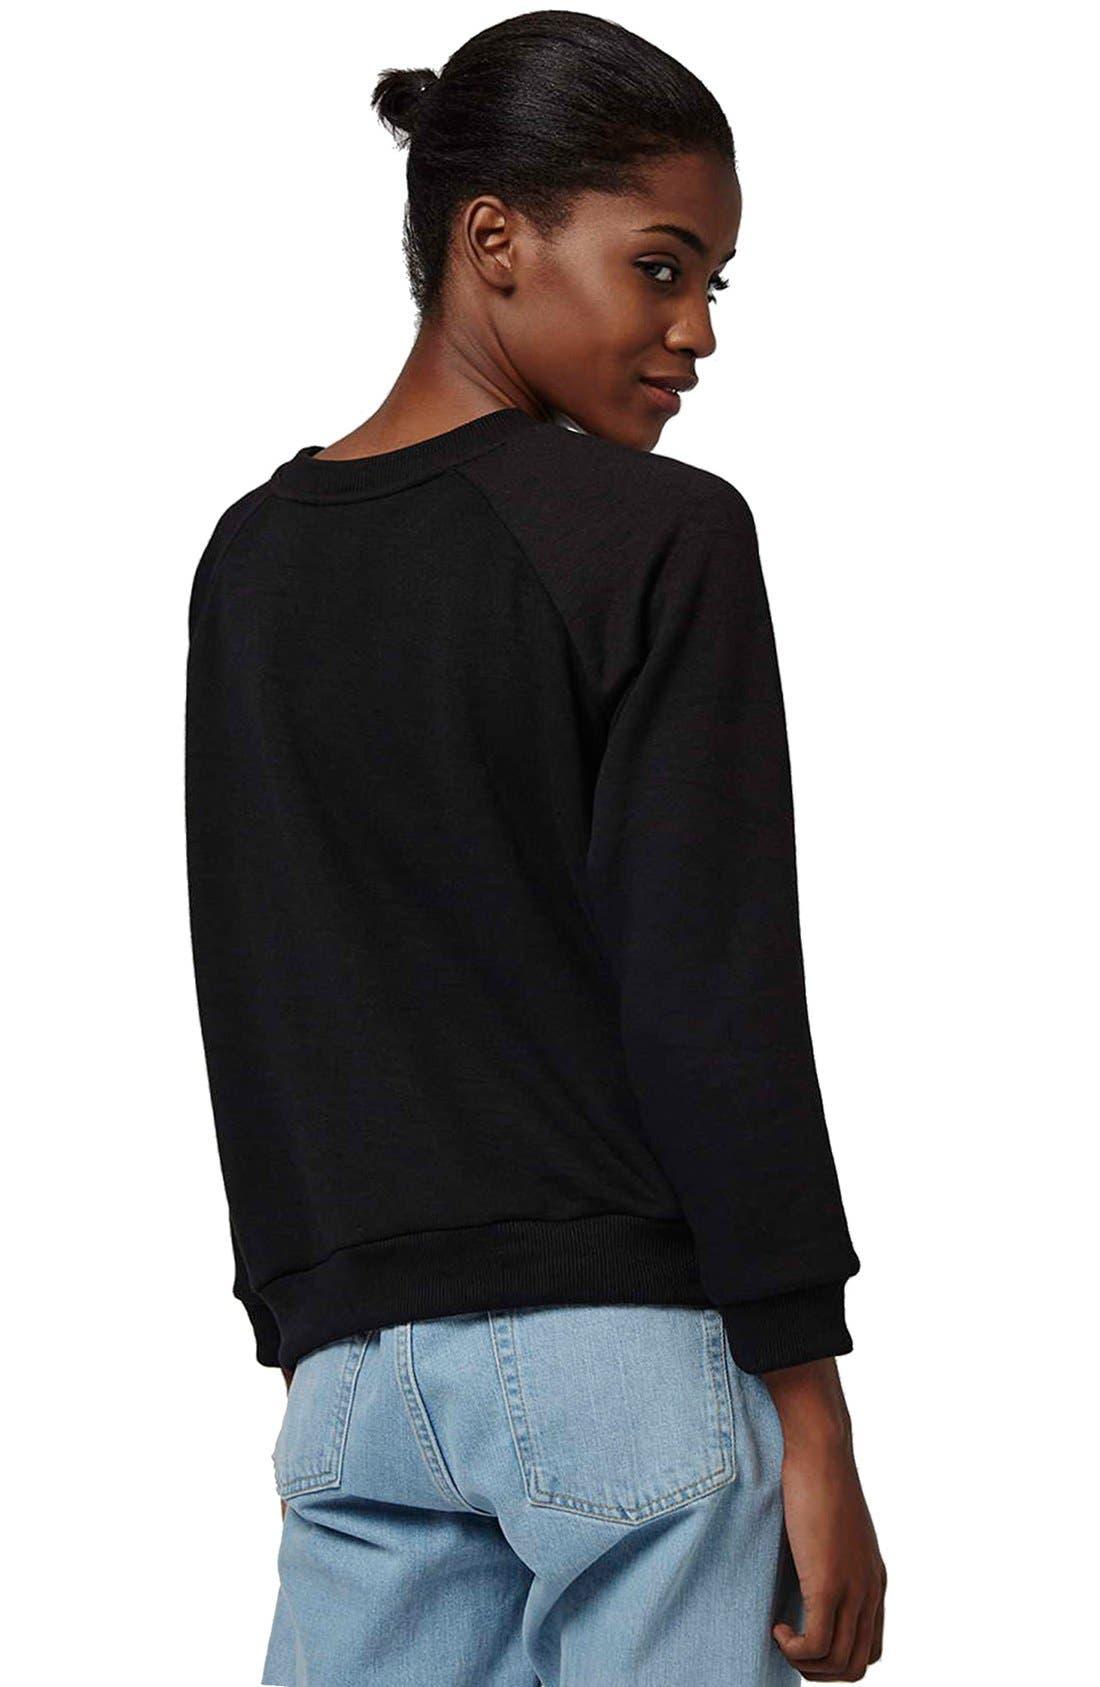 Alternate Image 2  - Topshop Tee and Cake 'Pepsi' Sweatshirt (Petite)